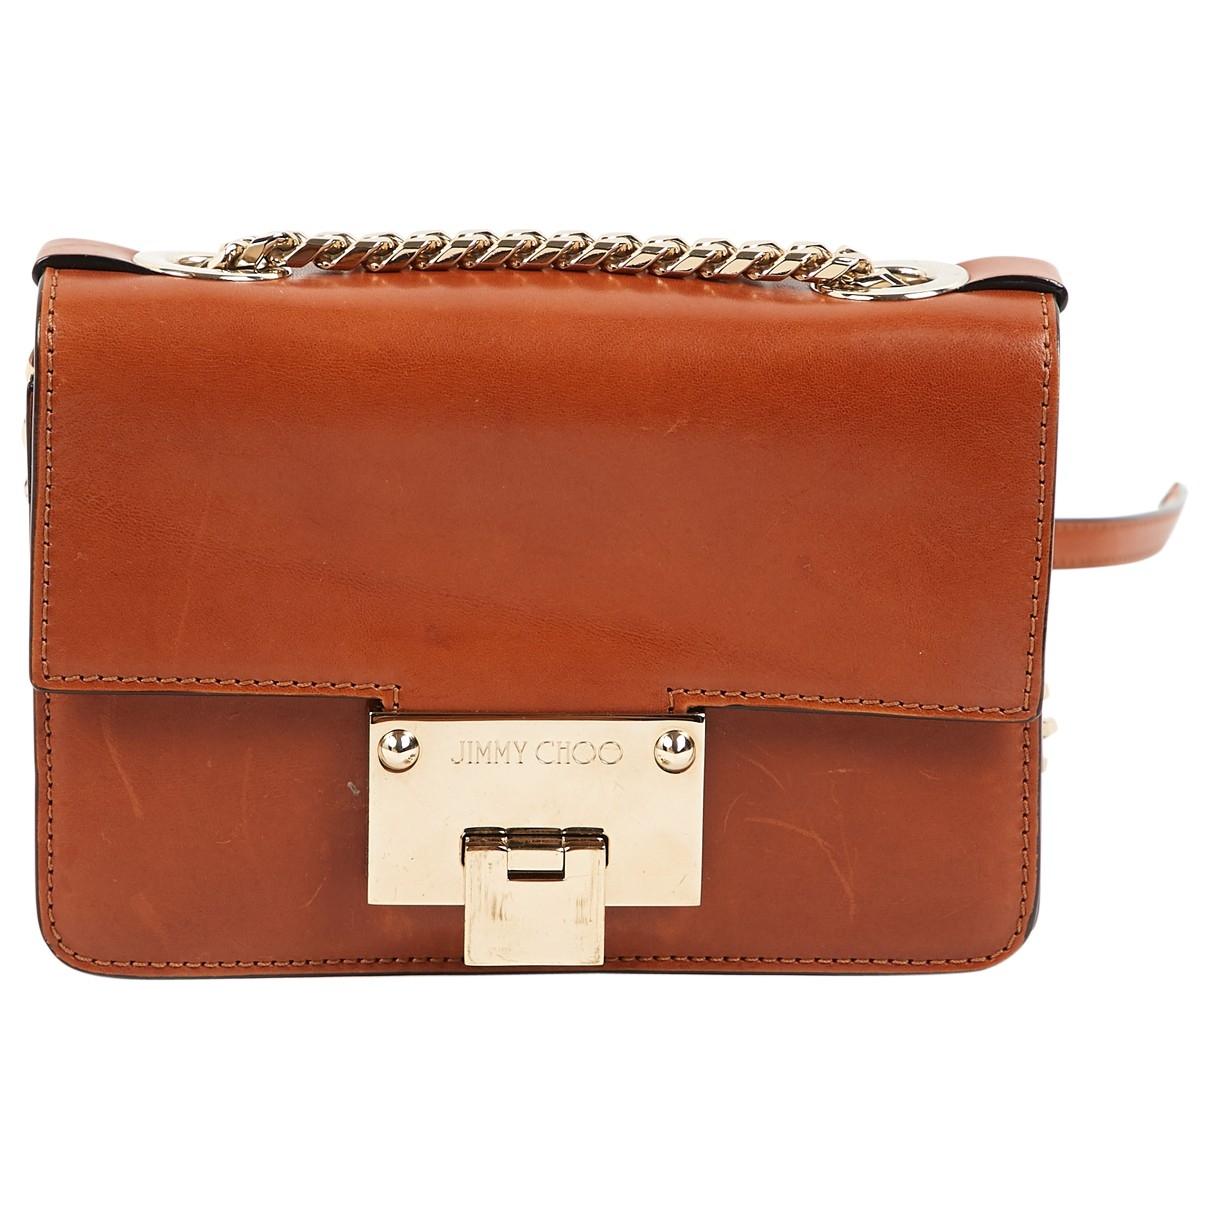 Jimmy Choo \N Camel Leather handbag for Women \N